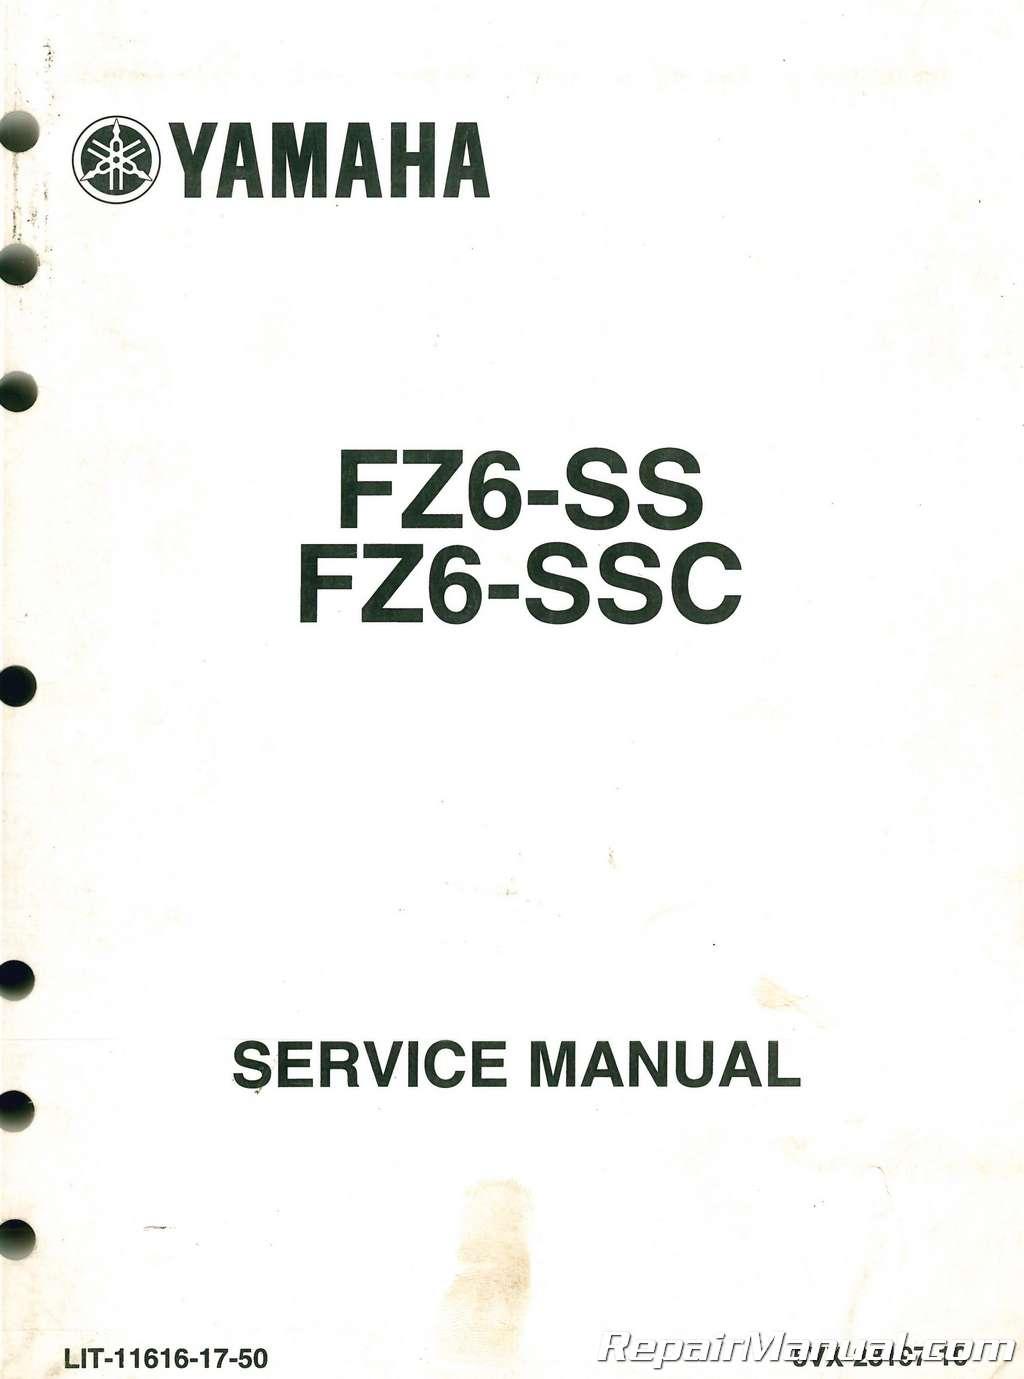 Used Yamaha Fz6 Motorcycle Service Manual